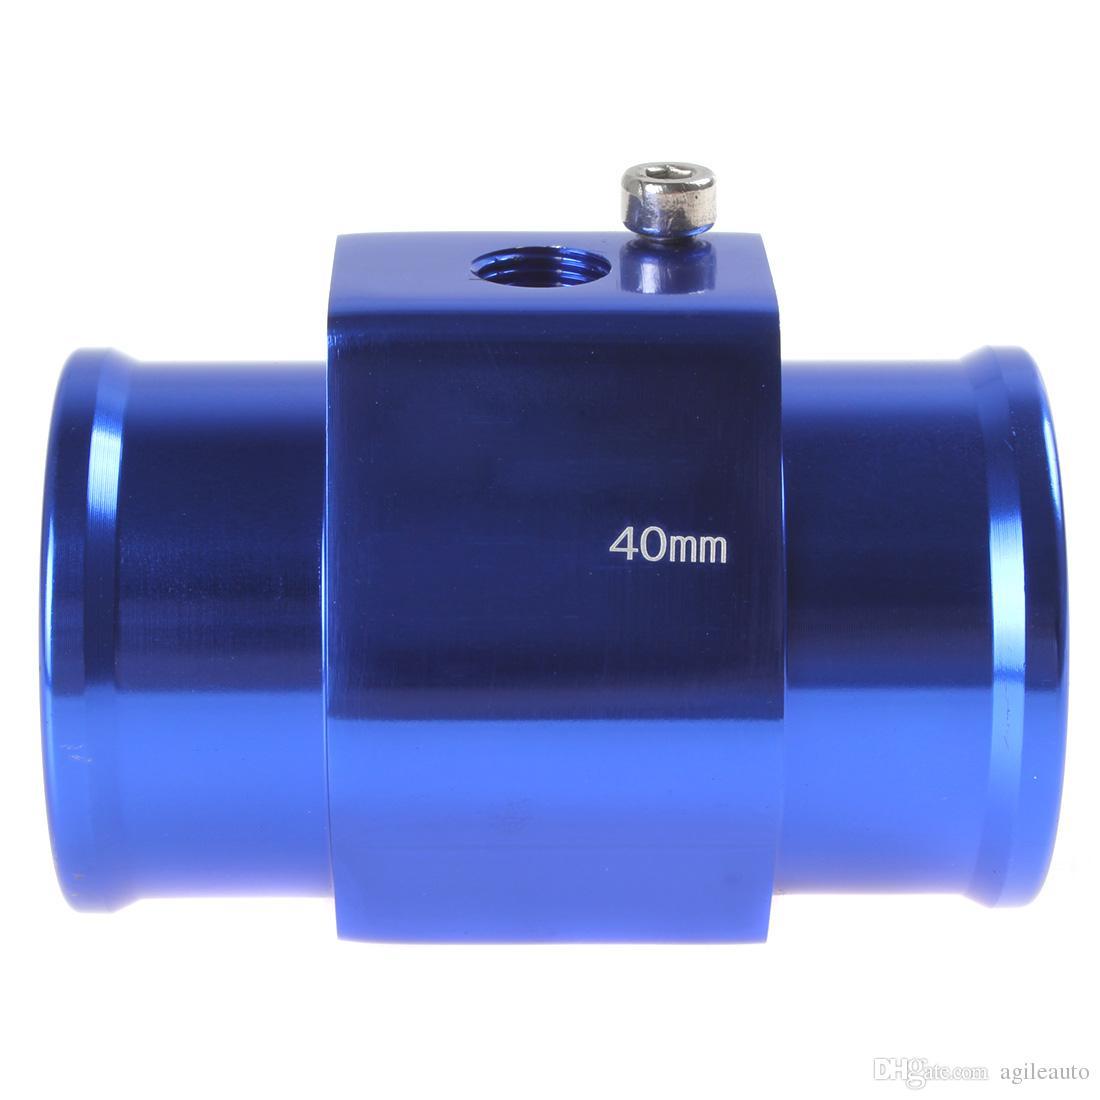 Blue Color Auto Car Water Temperature Sensor Adapter Water Temp Gauge Meter 40mm Aluminium with Clamps CEC_519